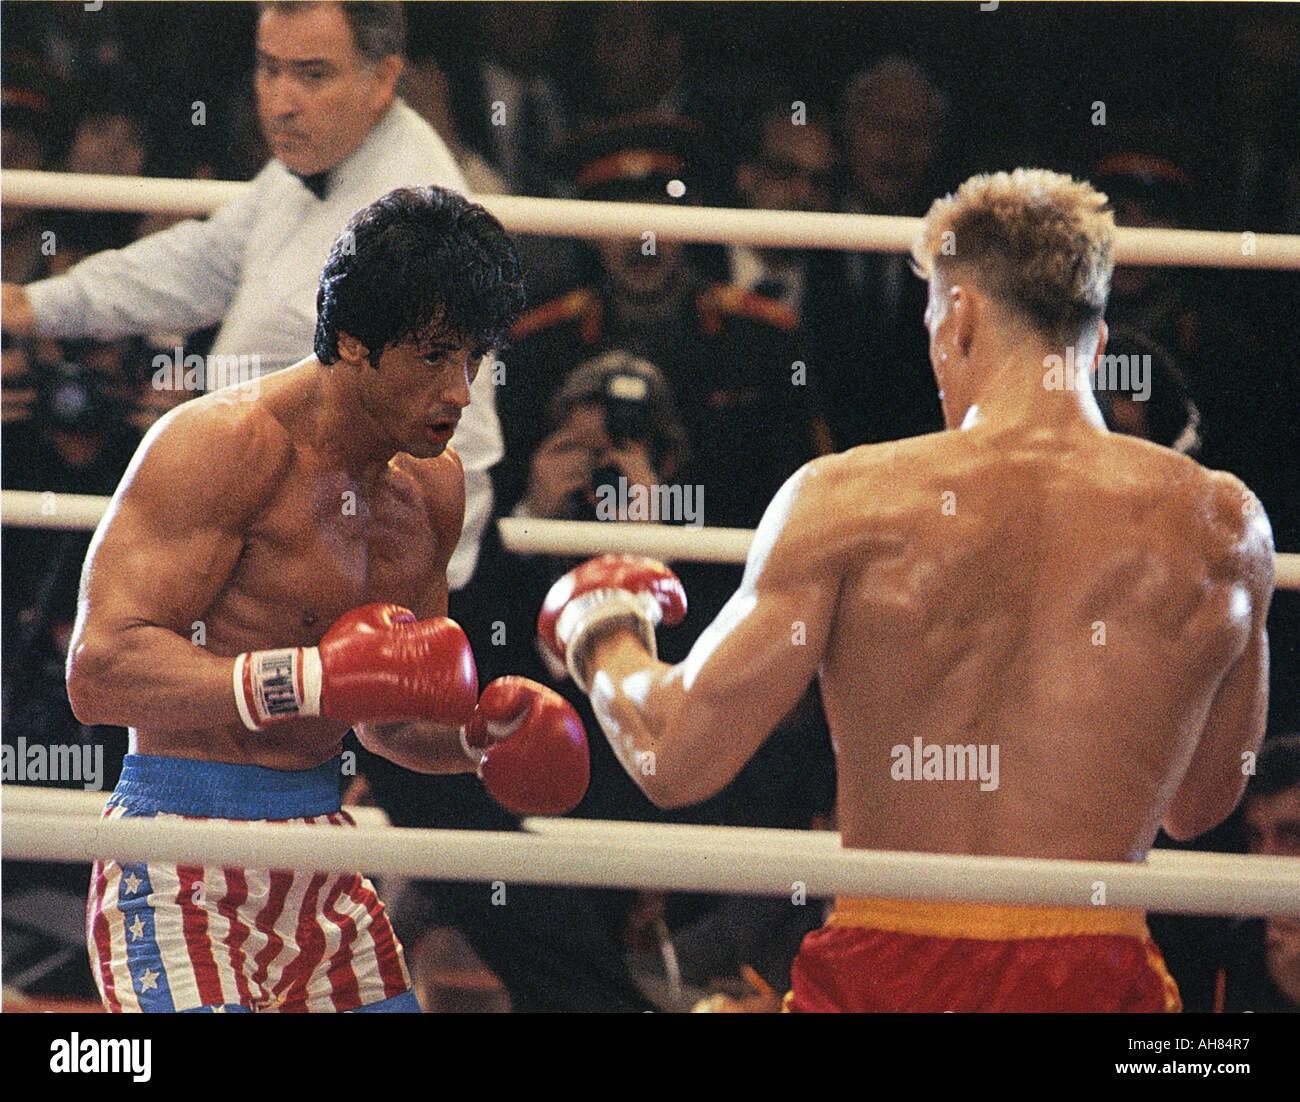 ROCKY IV 1985 MGM UA film avec Sylvester Stallone et Dolph Lundgren Banque D'Images